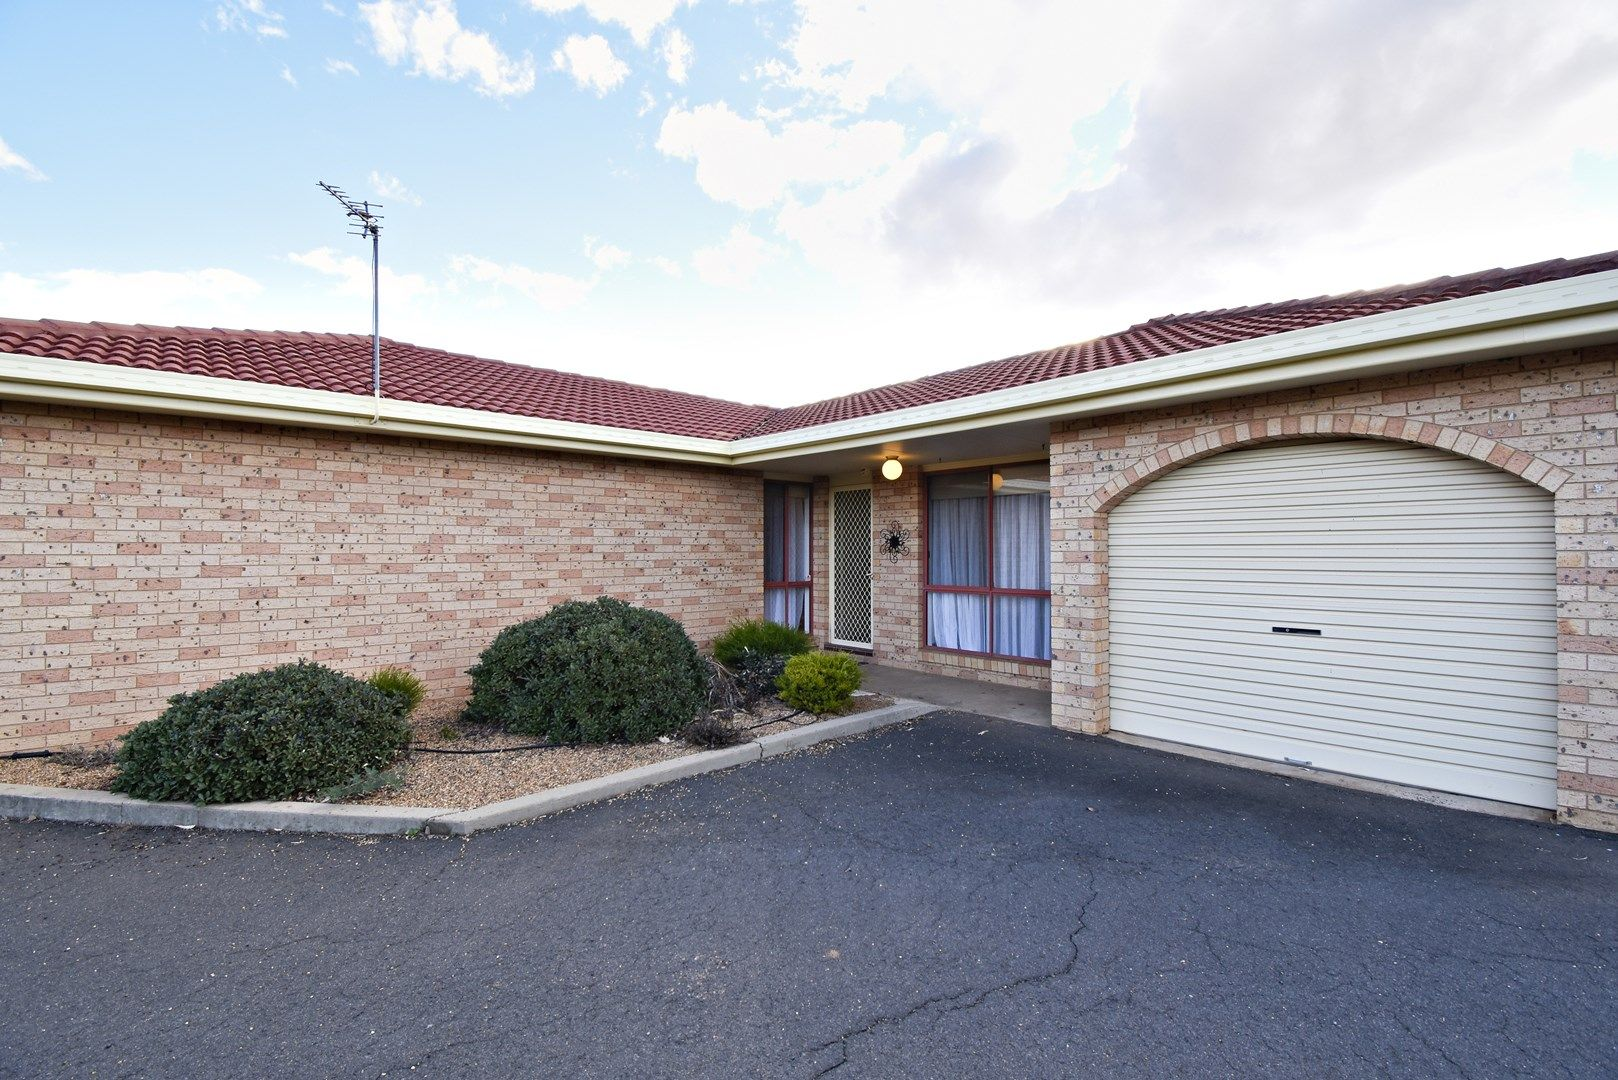 5/71 Baird  Drive, Dubbo NSW 2830, Image 0